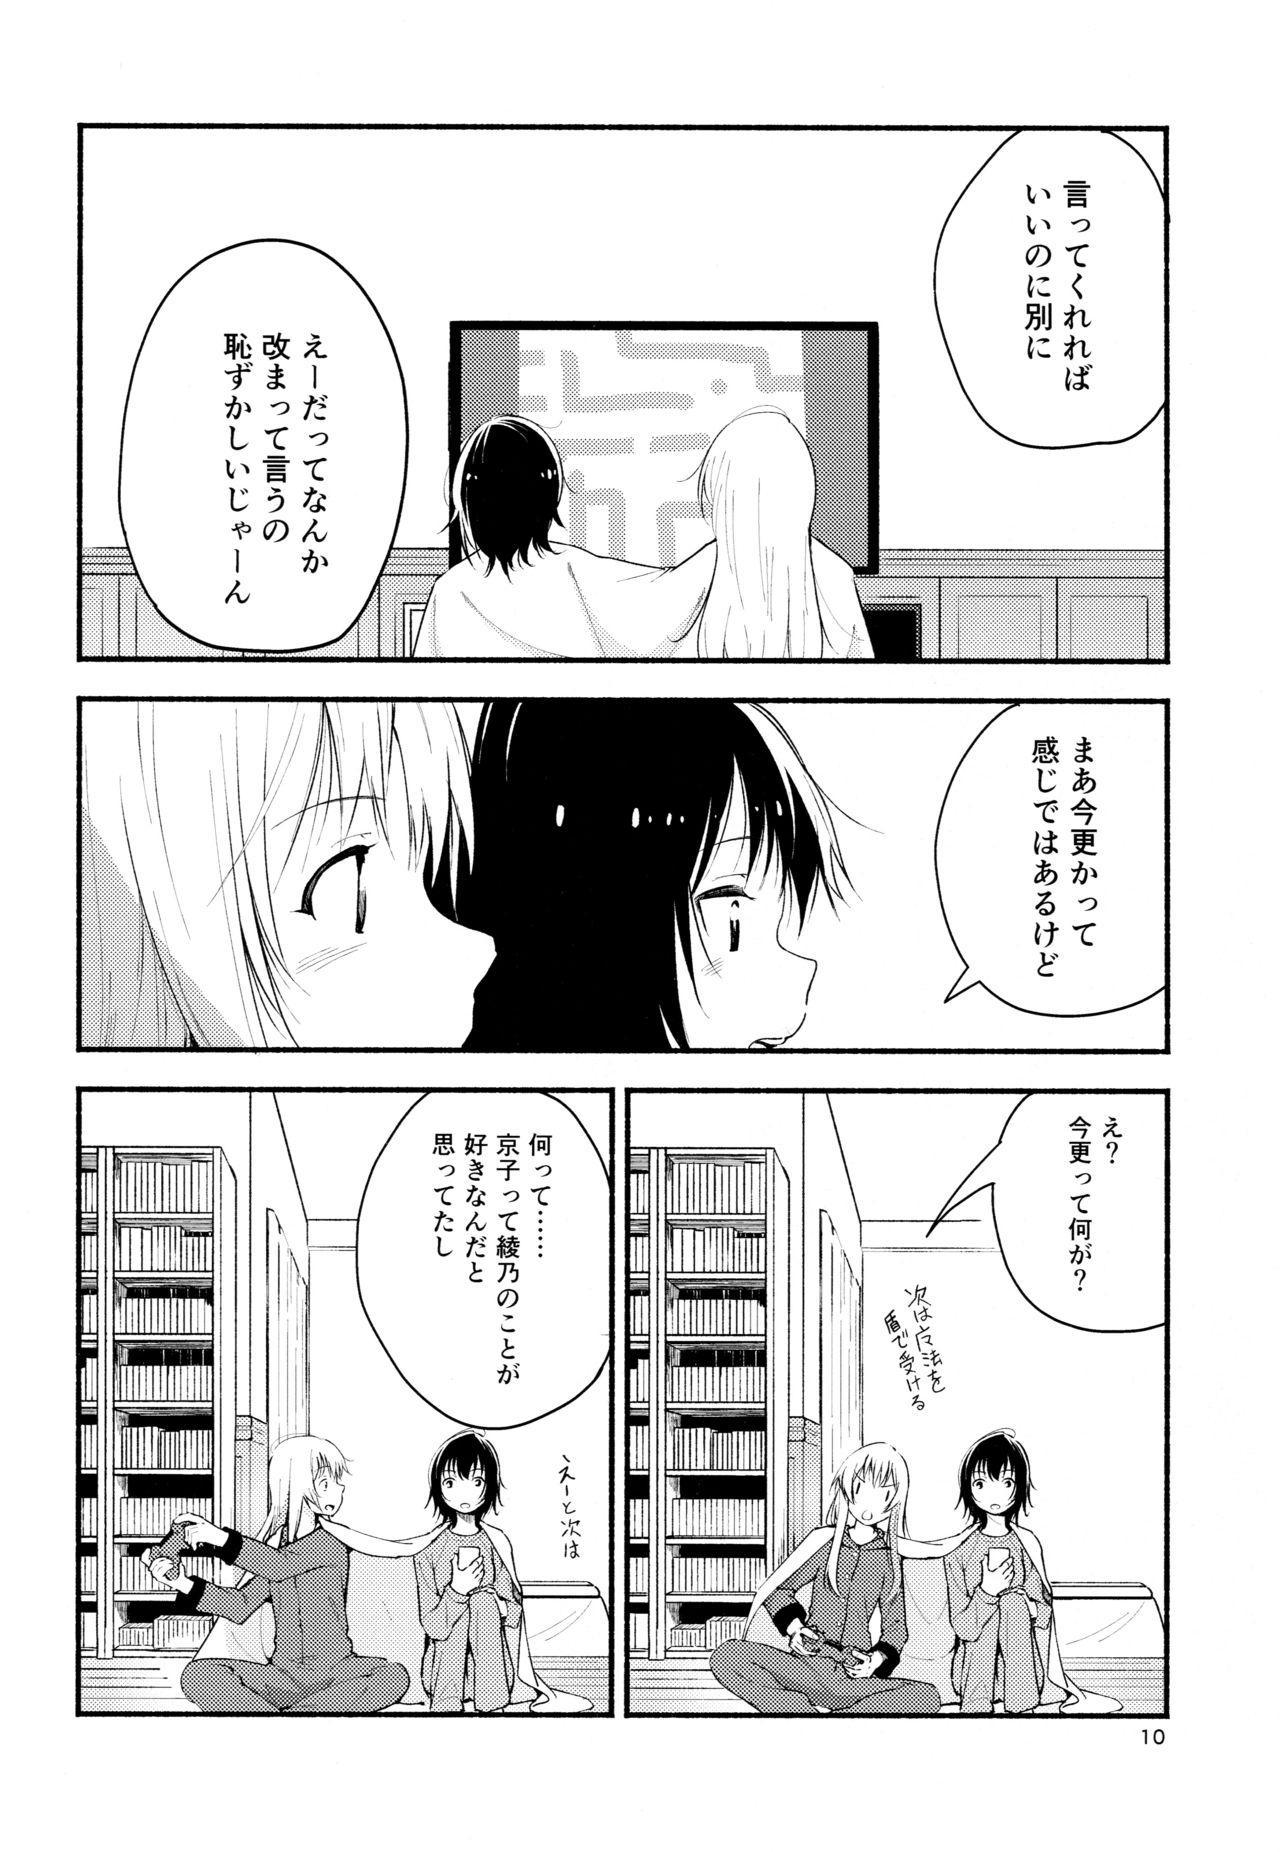 (Girls Love Festival 16) [G-complex (YUI_7)] Kyou mo Ashita mo Yurui Hibi o - Yui and Kyoko and forever loose day-to-day (YuruYuri) 8